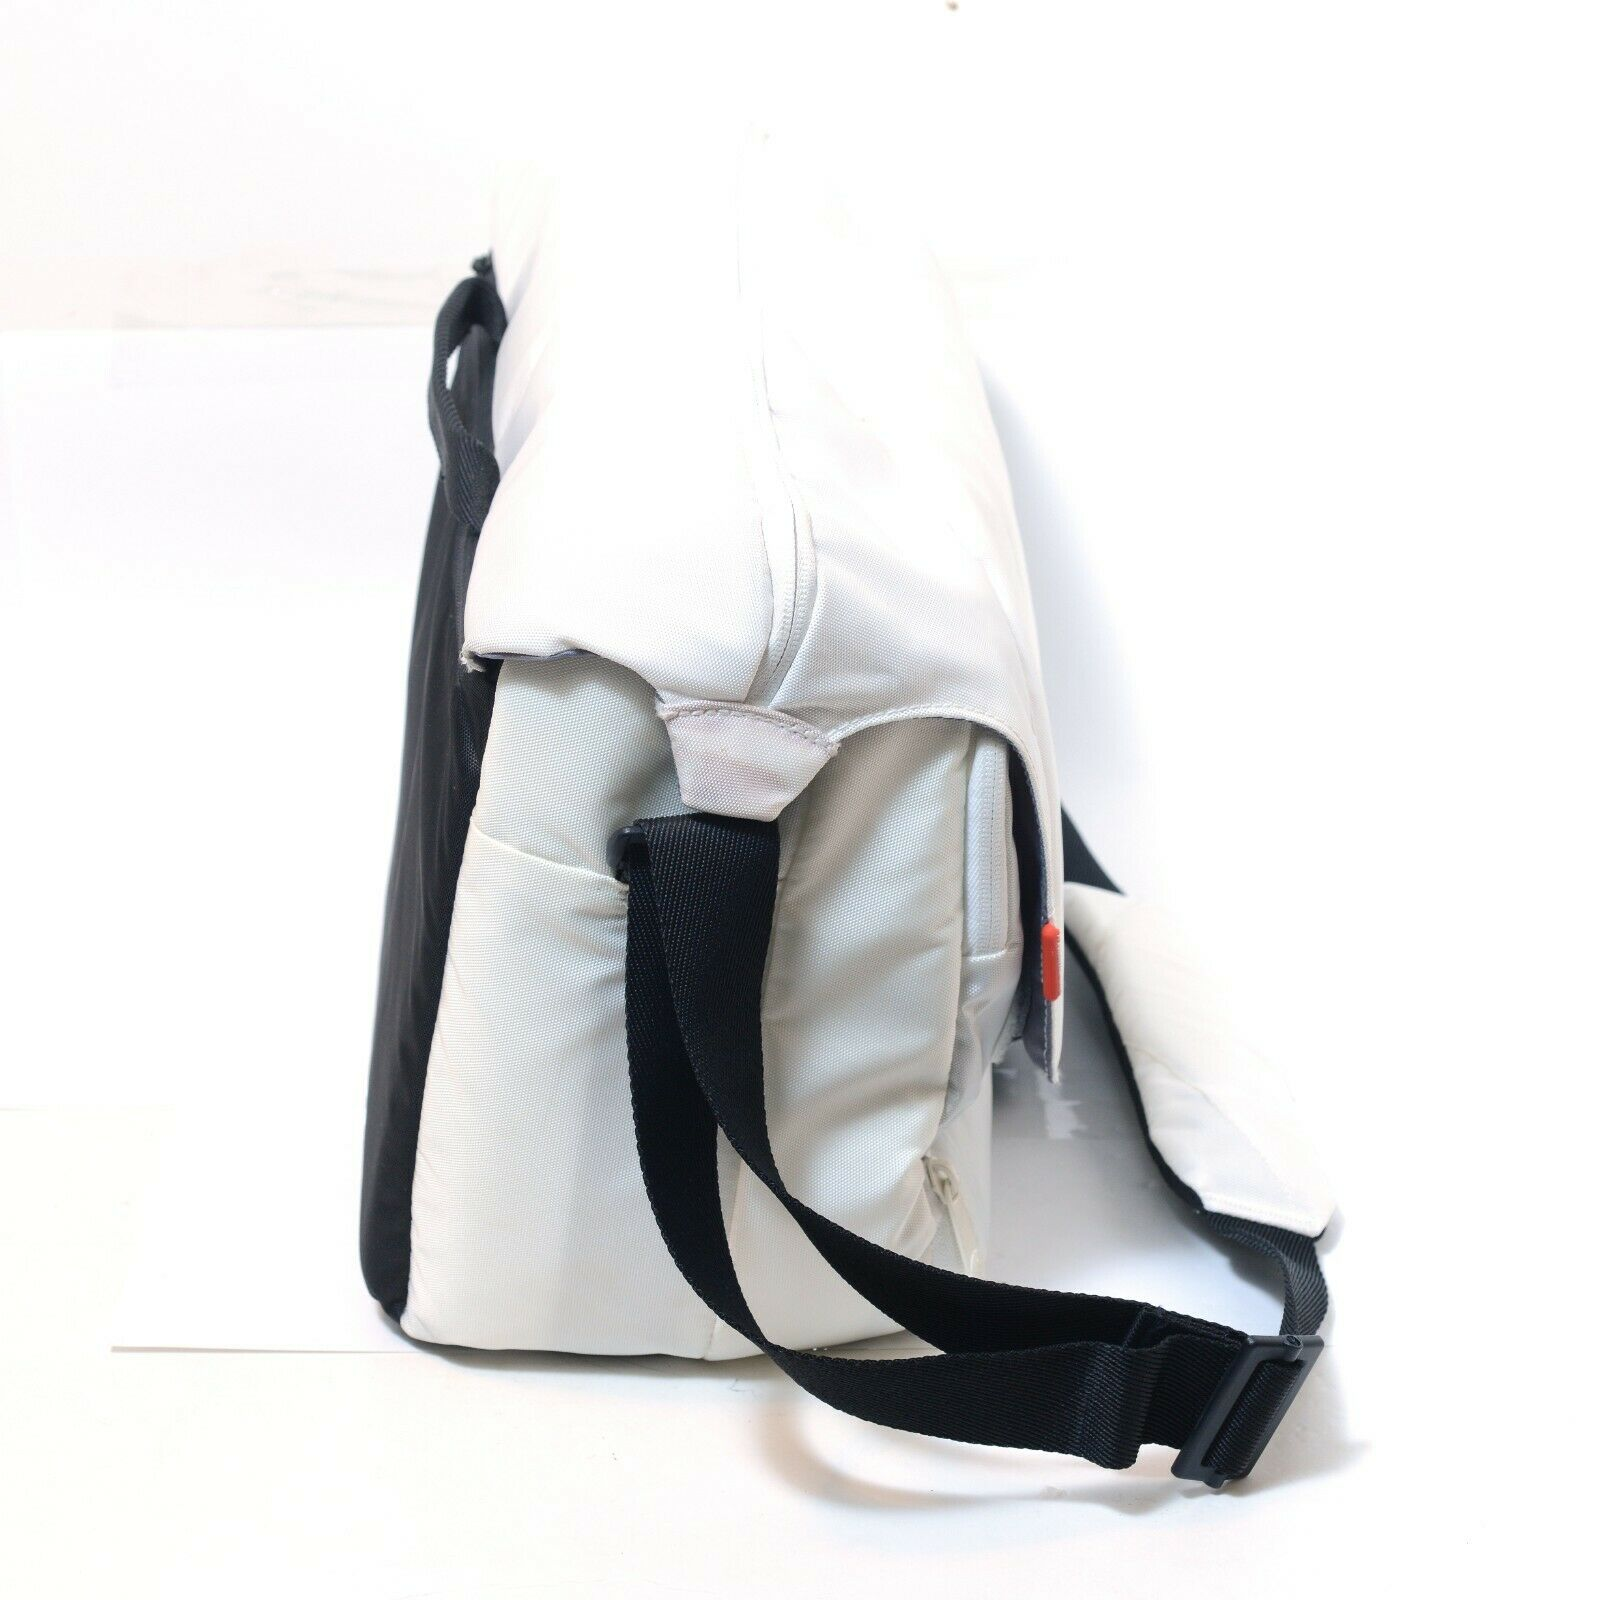 Manfrotto Unica V Messenger White DSLR Camera Lens Shoulder Photography Bag VGC